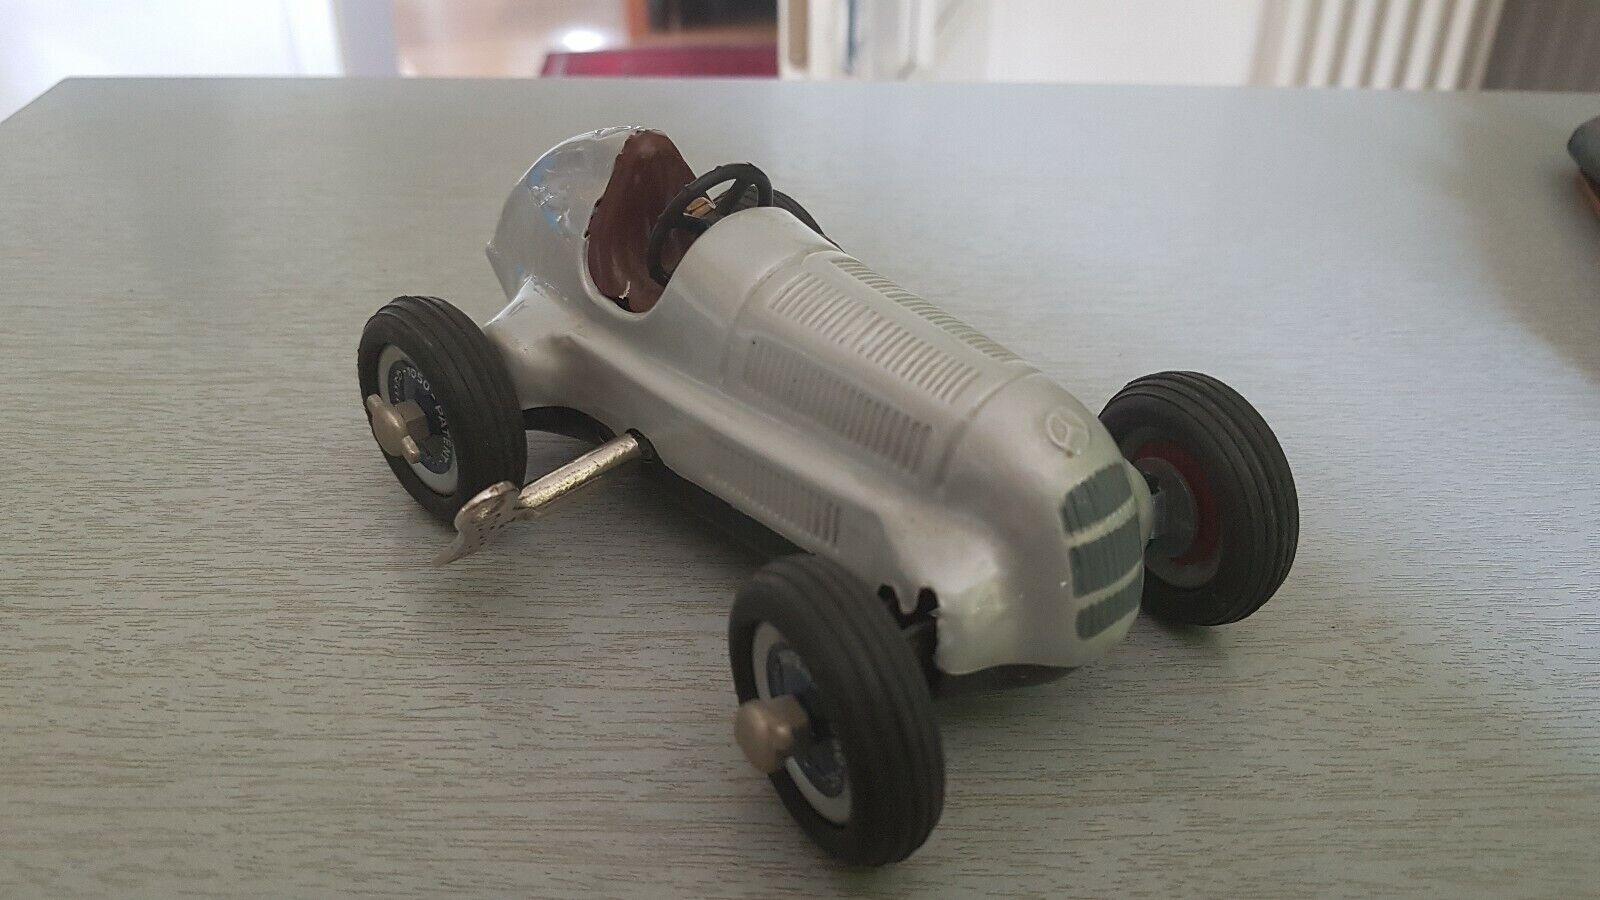 Modelauto Schuco Montage-Grand-Prix Nr. 2098 Mercedes 1936, Vitrinenmodell